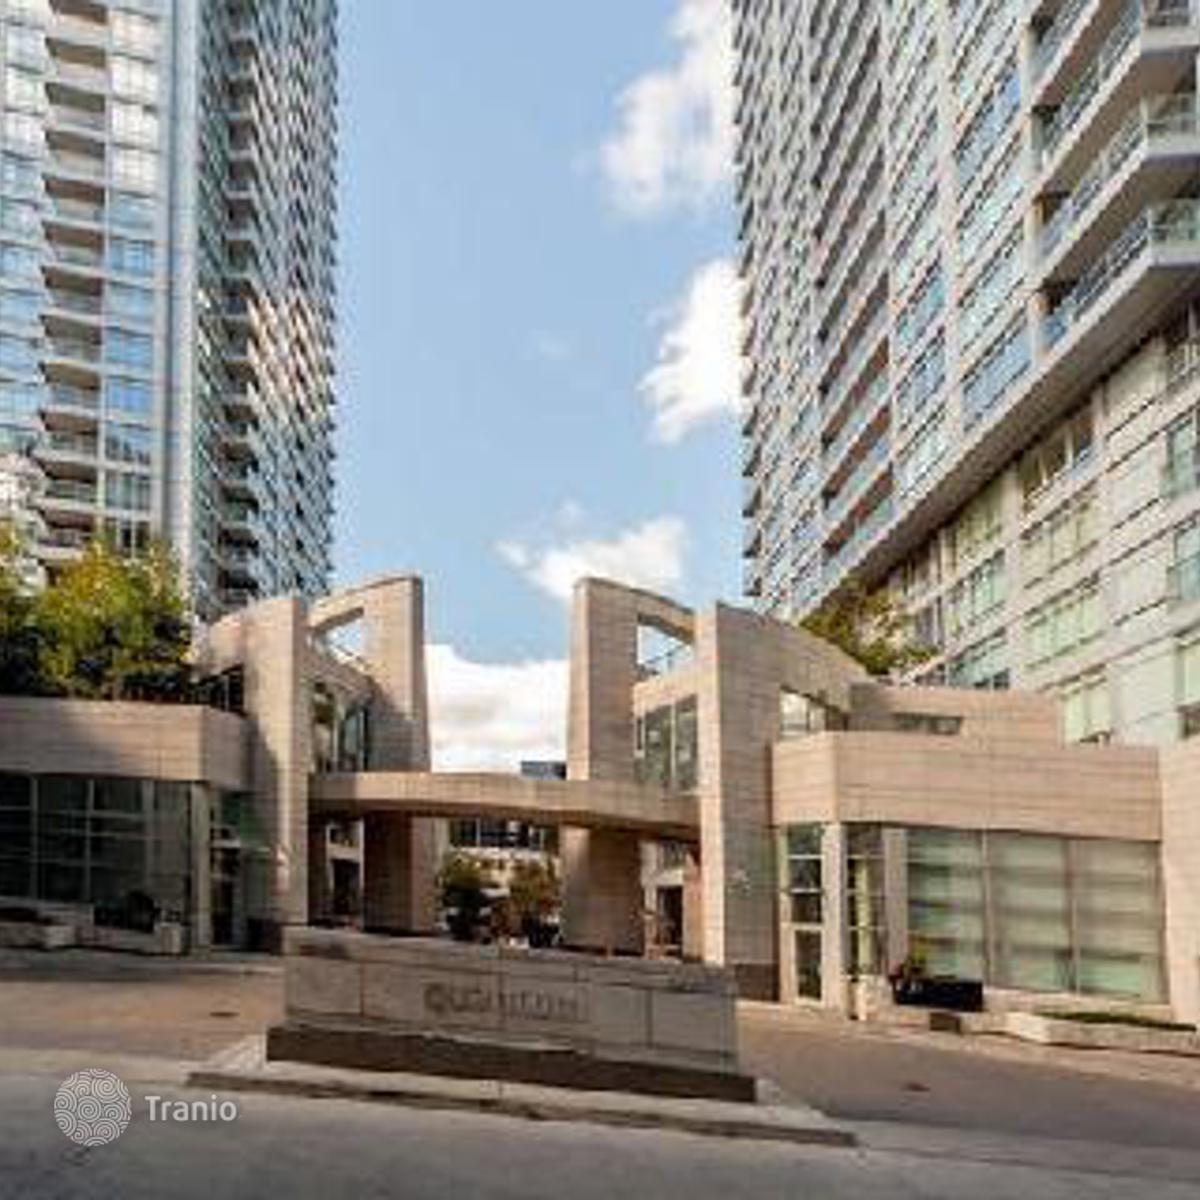 Canadian Apartments: Listing #1339271 In Toronto, Ontario, Canada